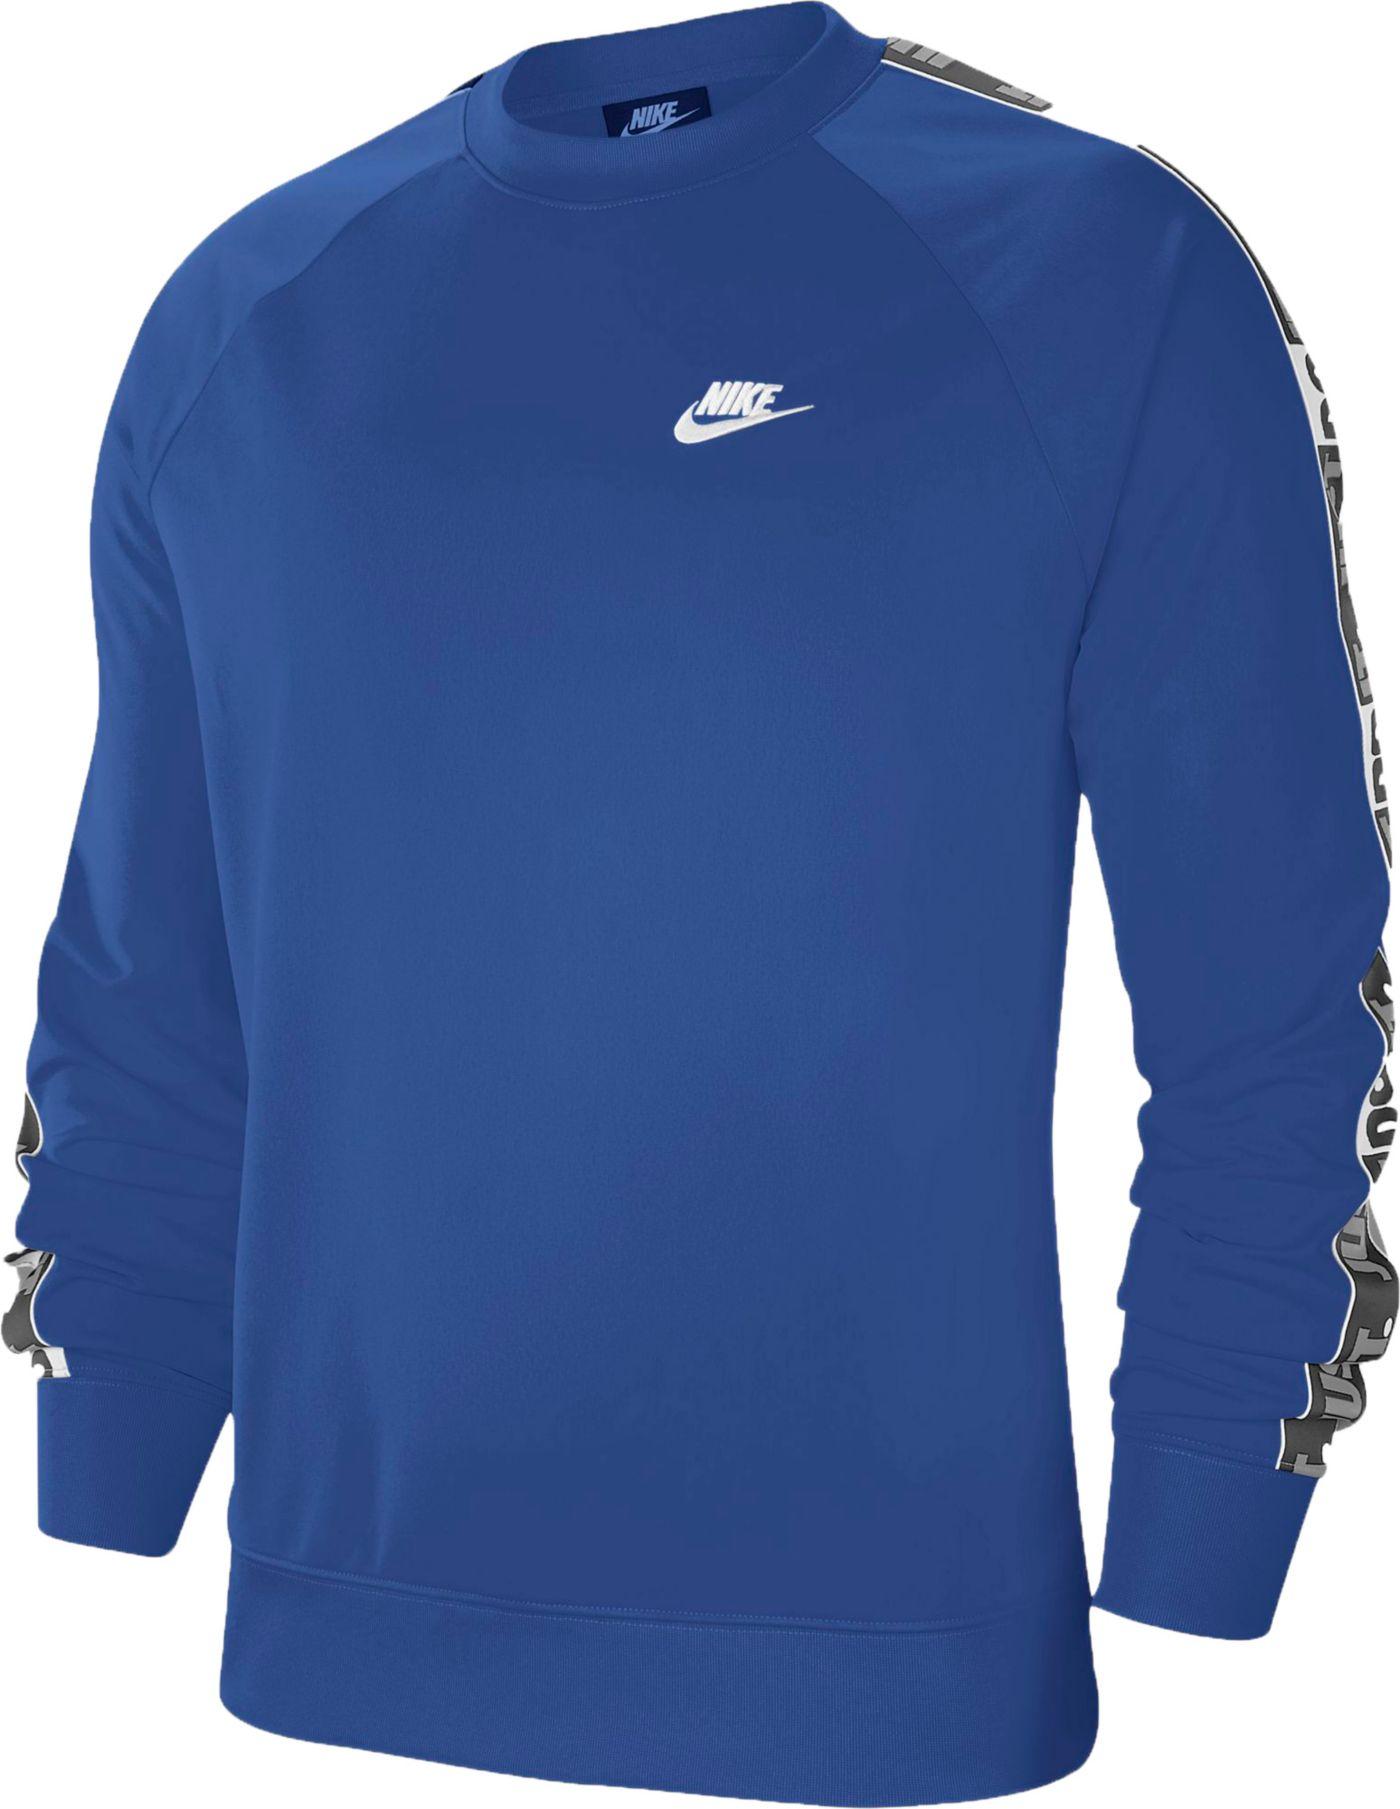 Nike Men's Sportswear JDI Crewneck